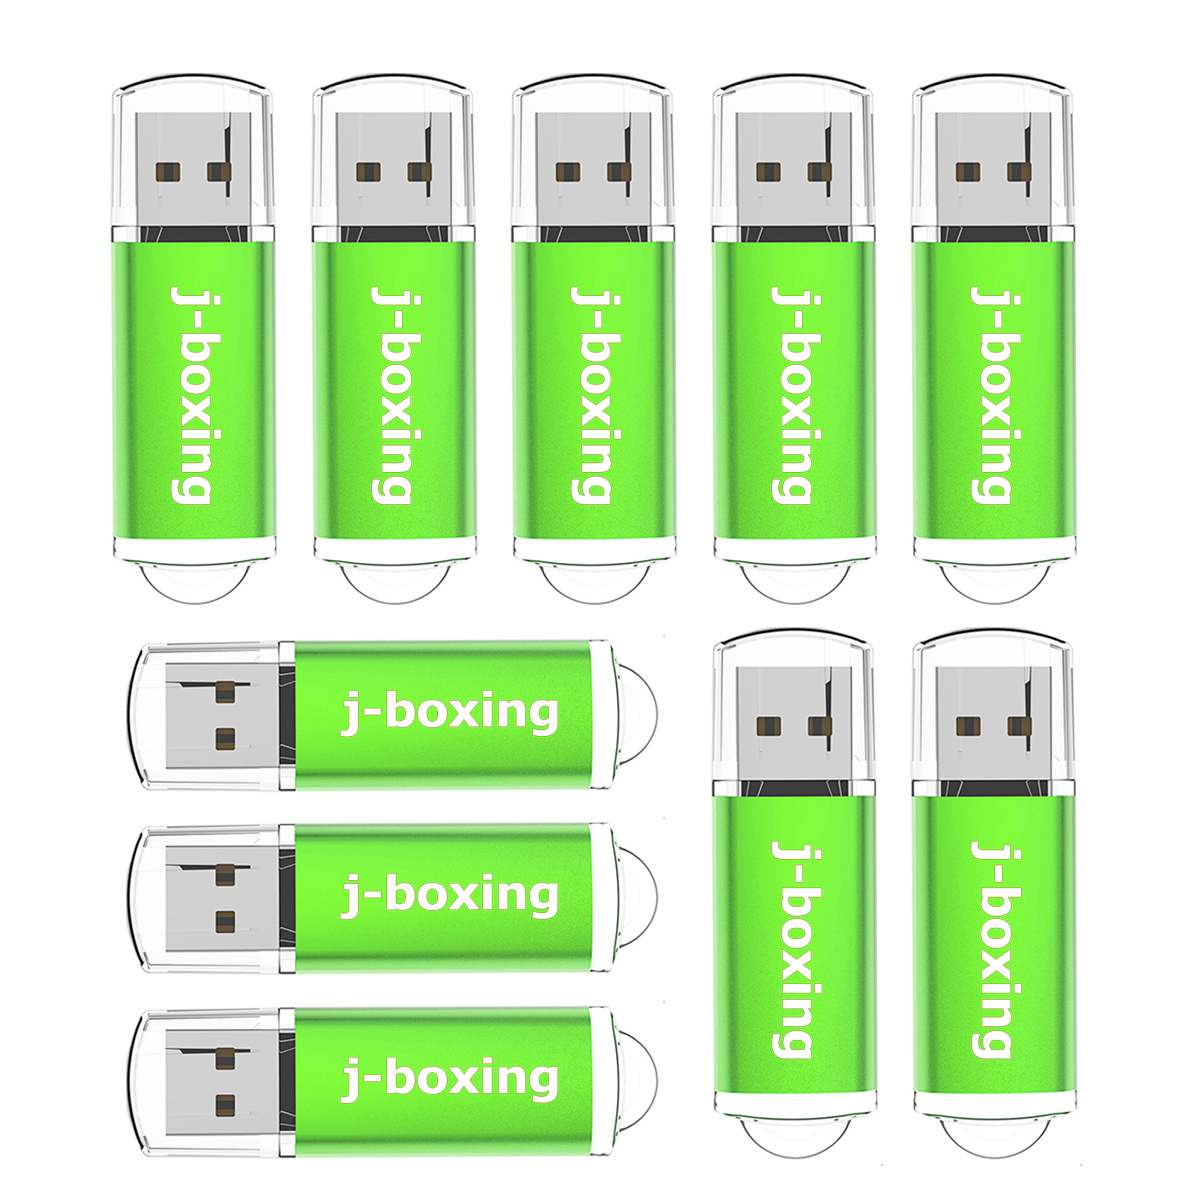 J-boxing 10PCS 256MB USB Flash Drive Pack 64MB 128MB 512MB Small Cacapity USB Storage Thumb Drive Jump Drive Pen Drive Green